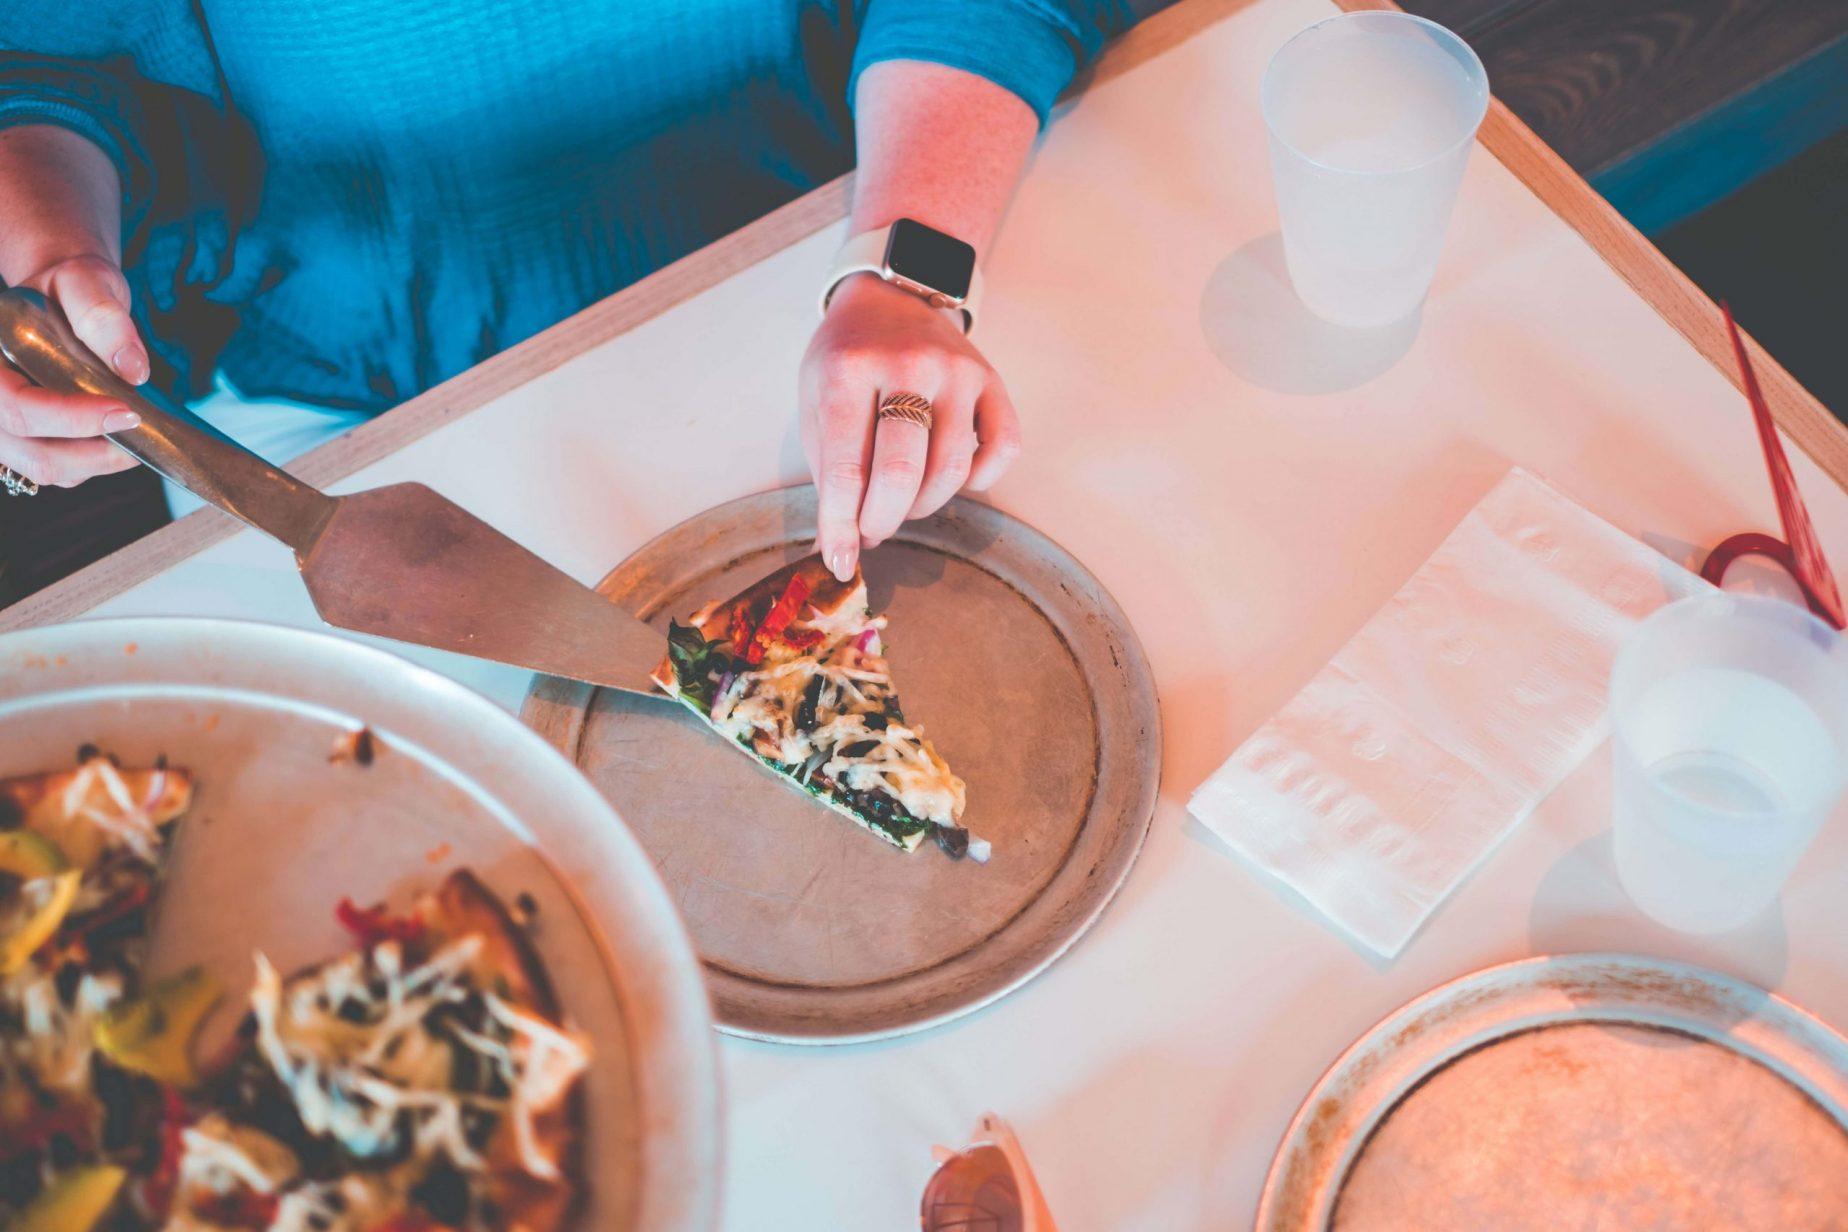 Where To Find The Best Gluten Free Pizza On 30A #whatsavvysaid #glutenfree #glutenfreepizza #30a #rosemarybeach #bestpizza30a #rosemarybeachpizza #veganglutenfreepizza